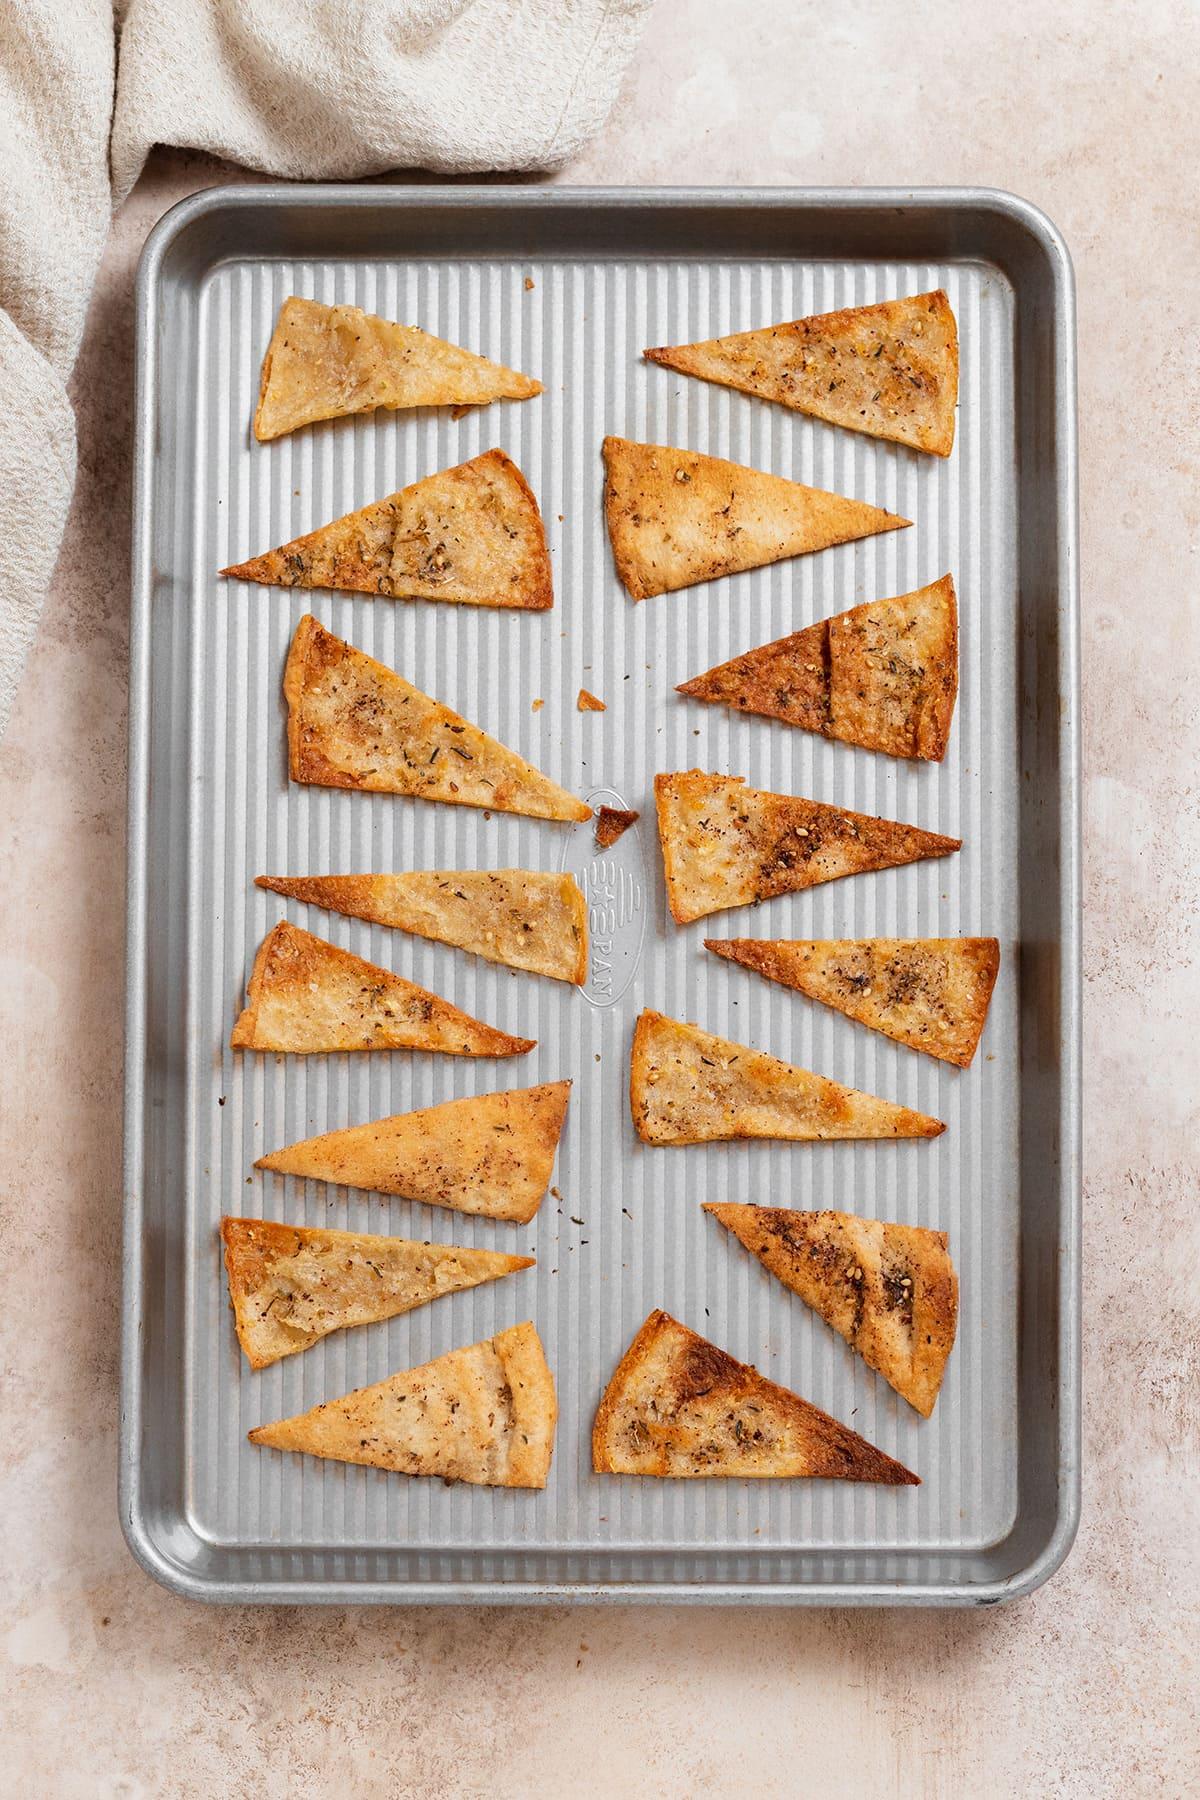 Homemade pita chips on a silver baking sheet.